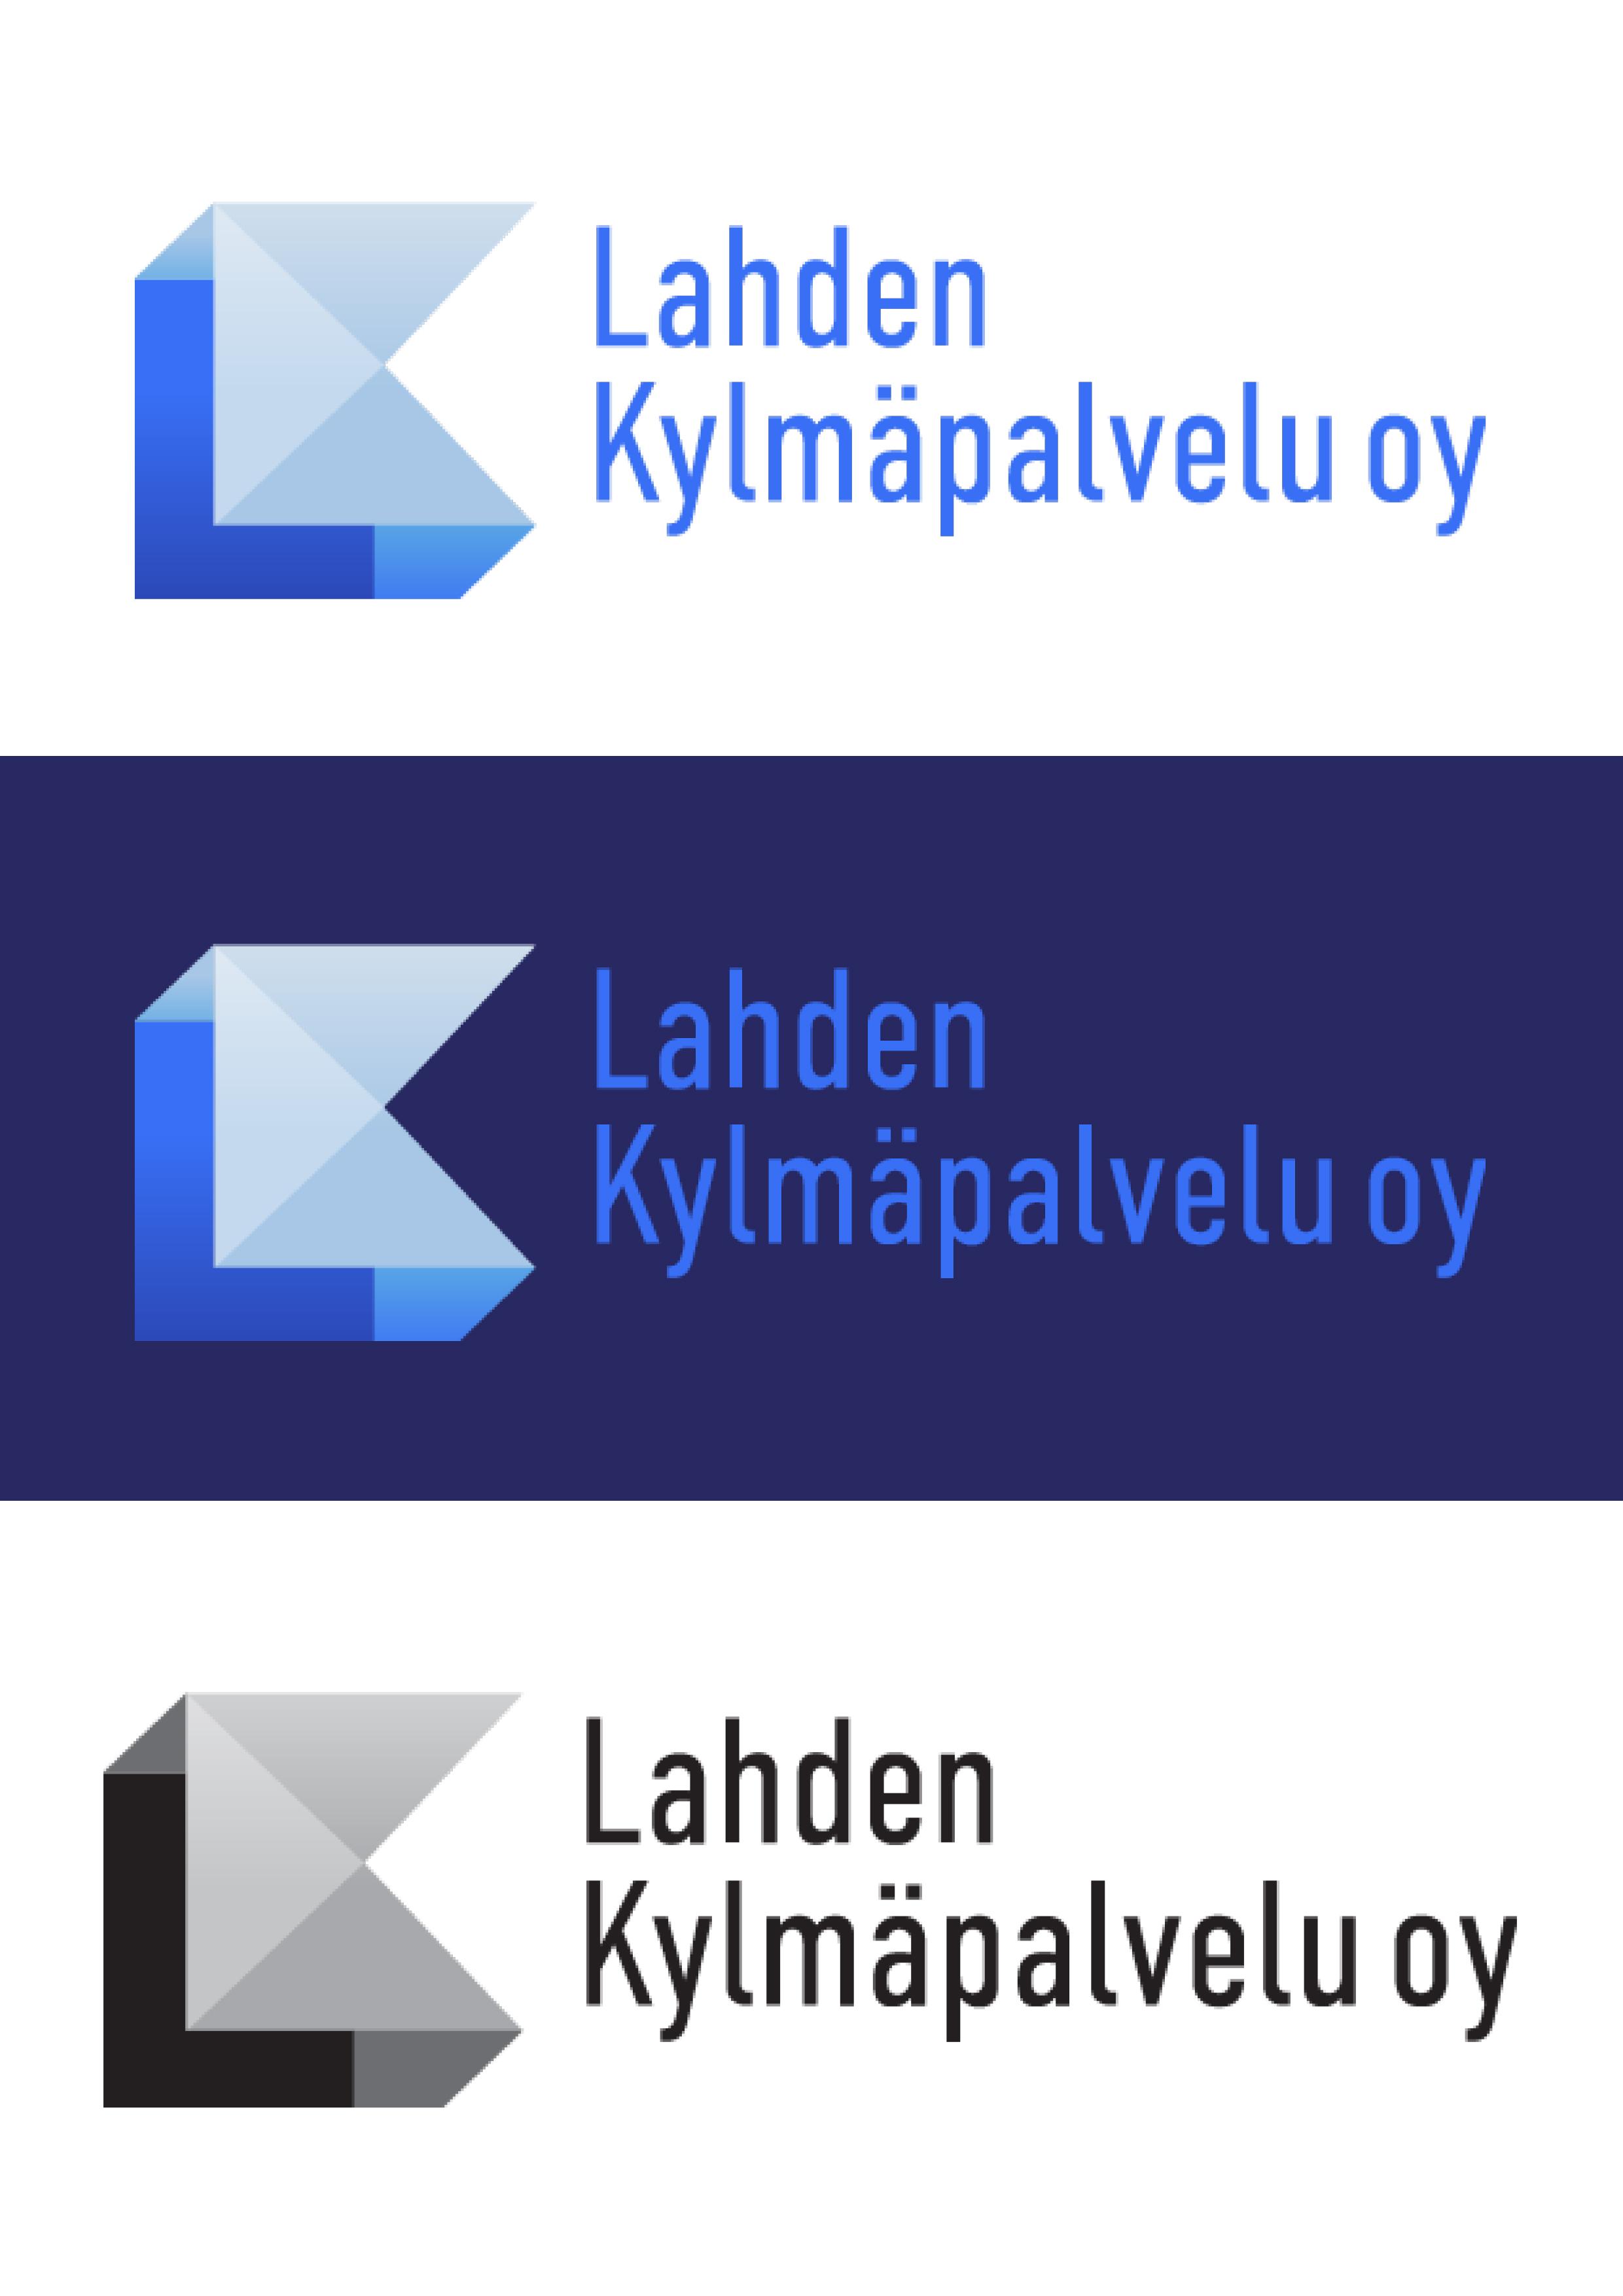 lk-logo-mockup